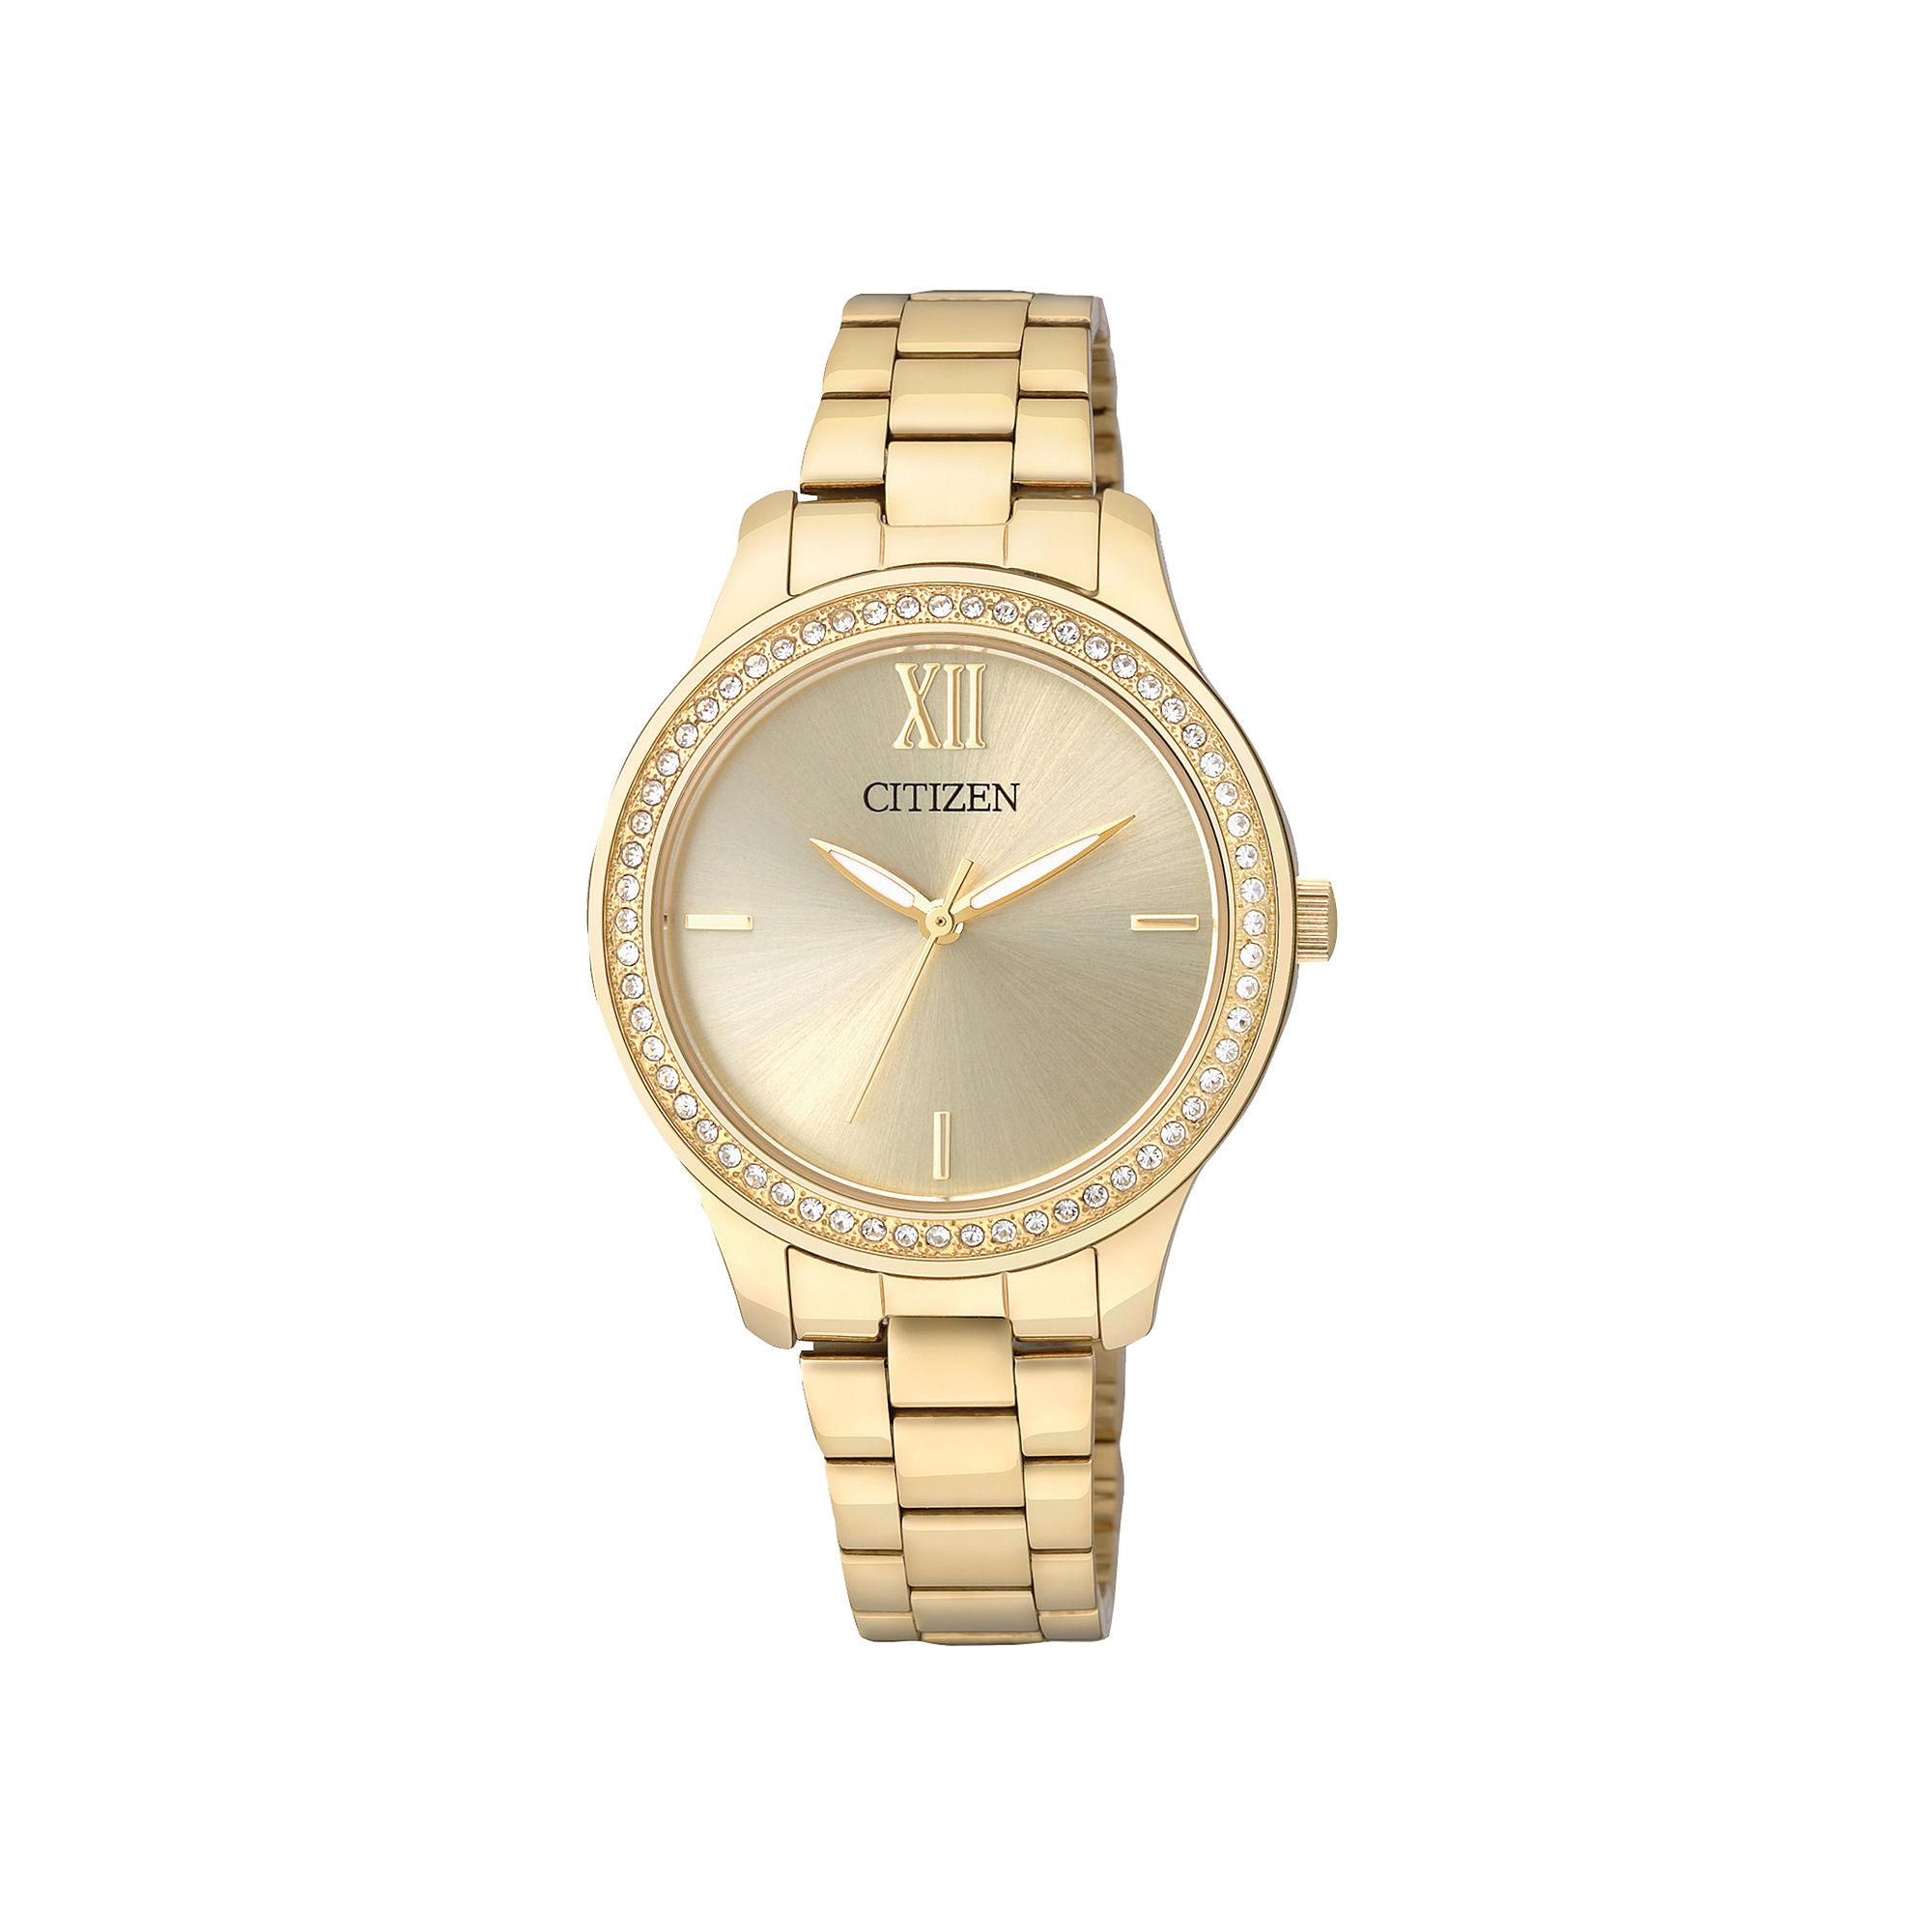 Citizen Pocket Watches Upc Barcode Ca4280 53e 013205110924